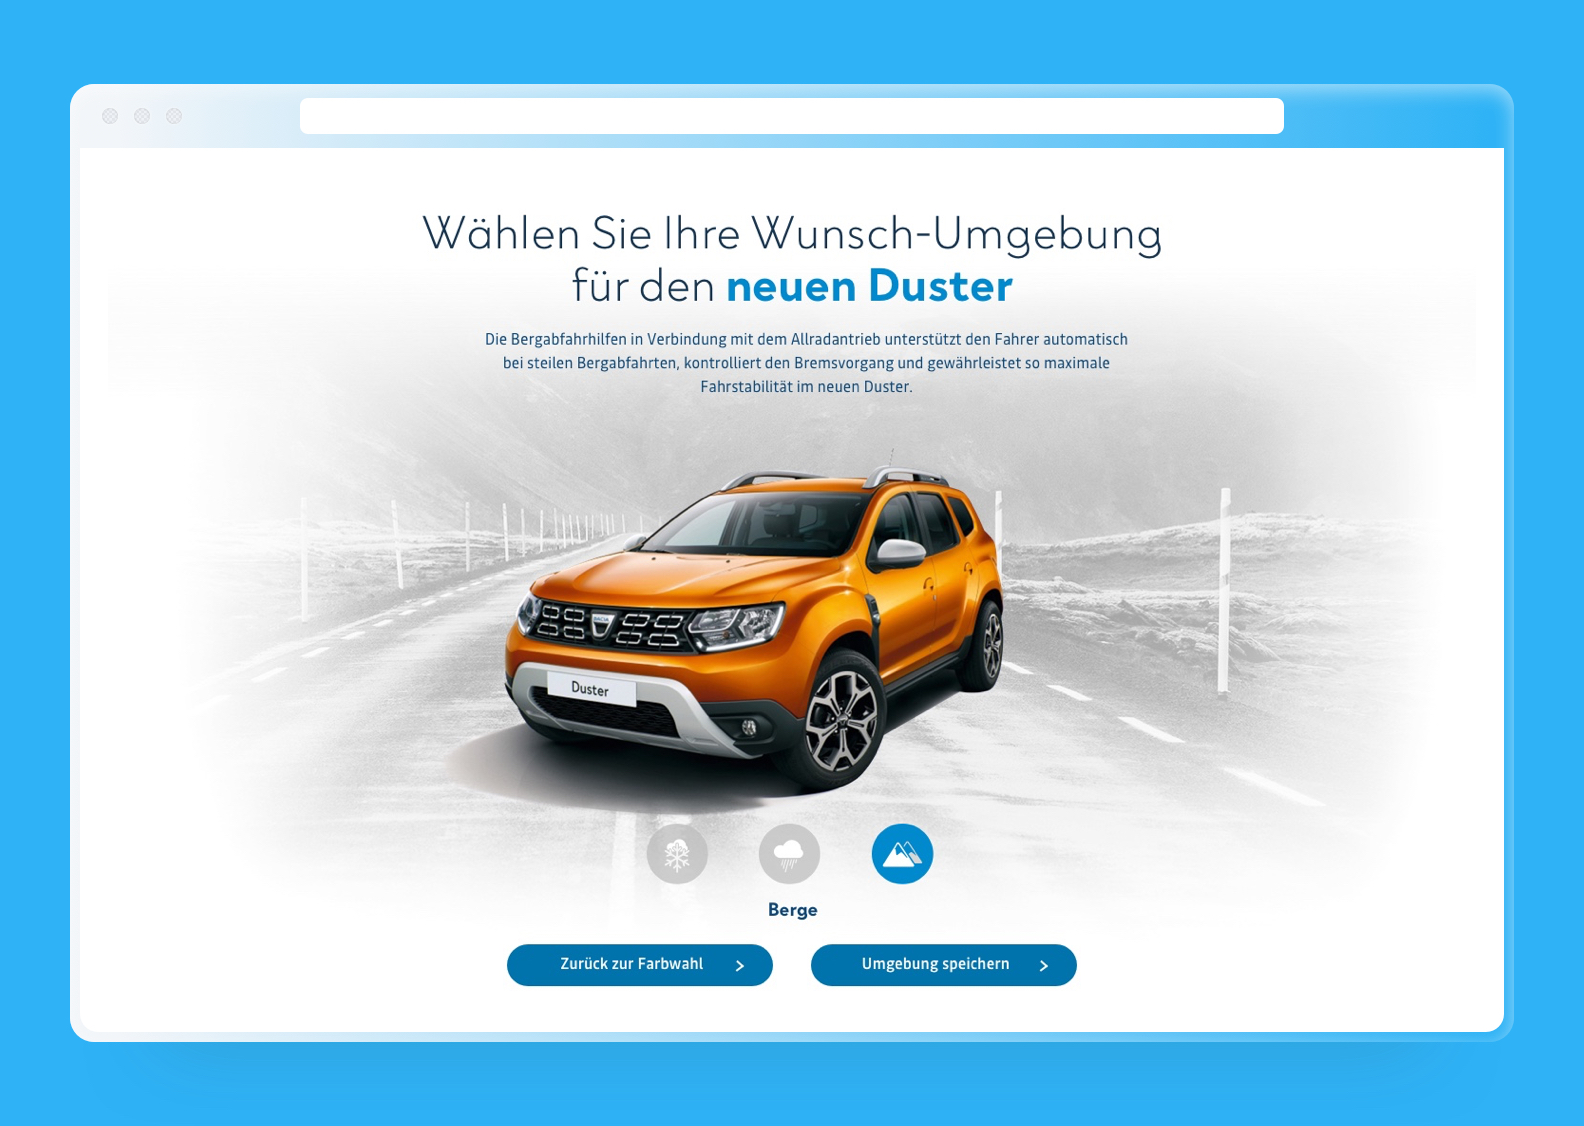 Dacia_Environments.jpg